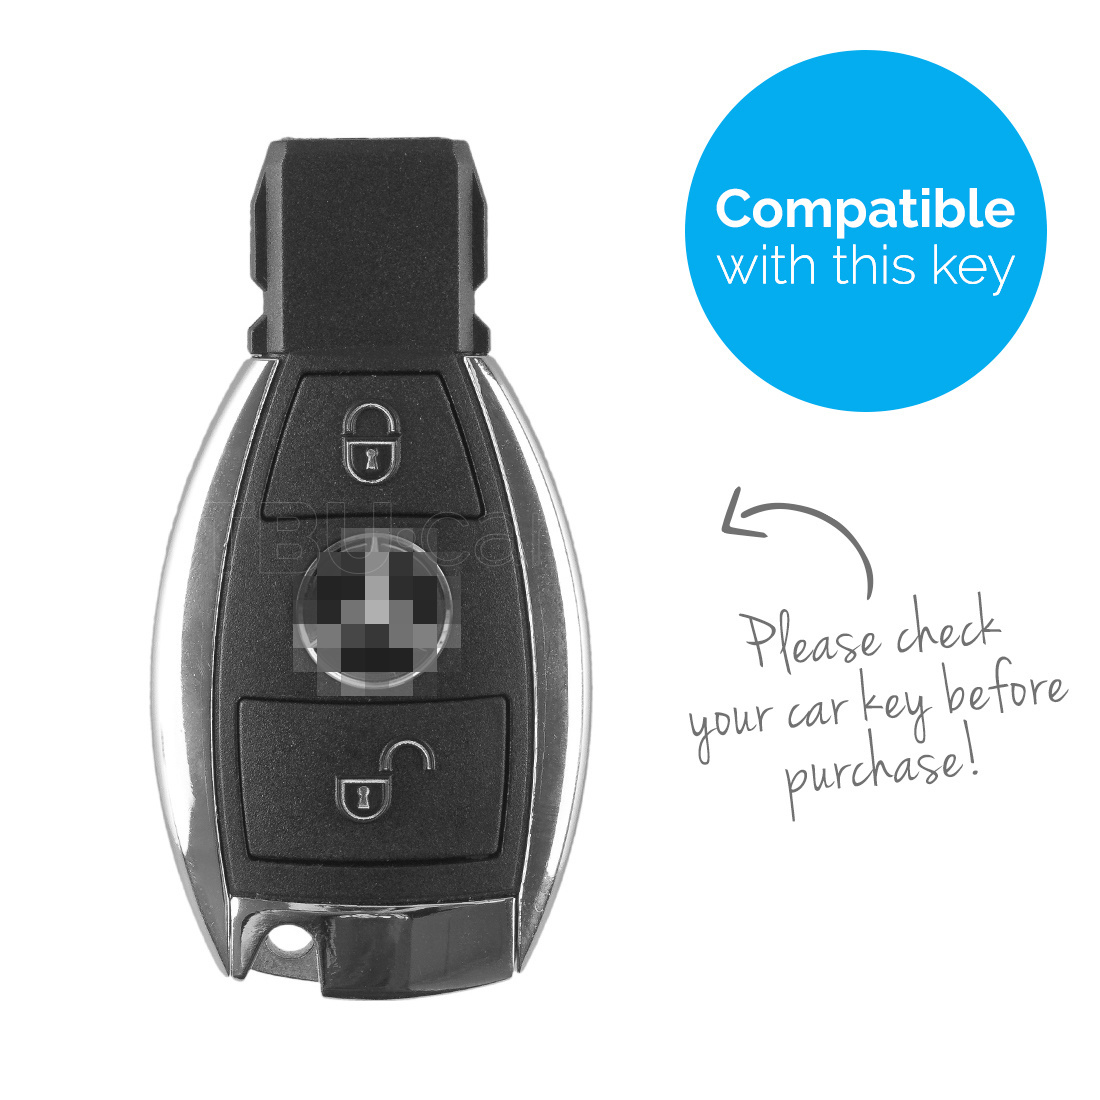 TBU car TBU car Sleutel cover compatibel met Mercedes - Silicone sleutelhoesje - beschermhoesje autosleutel - Paars